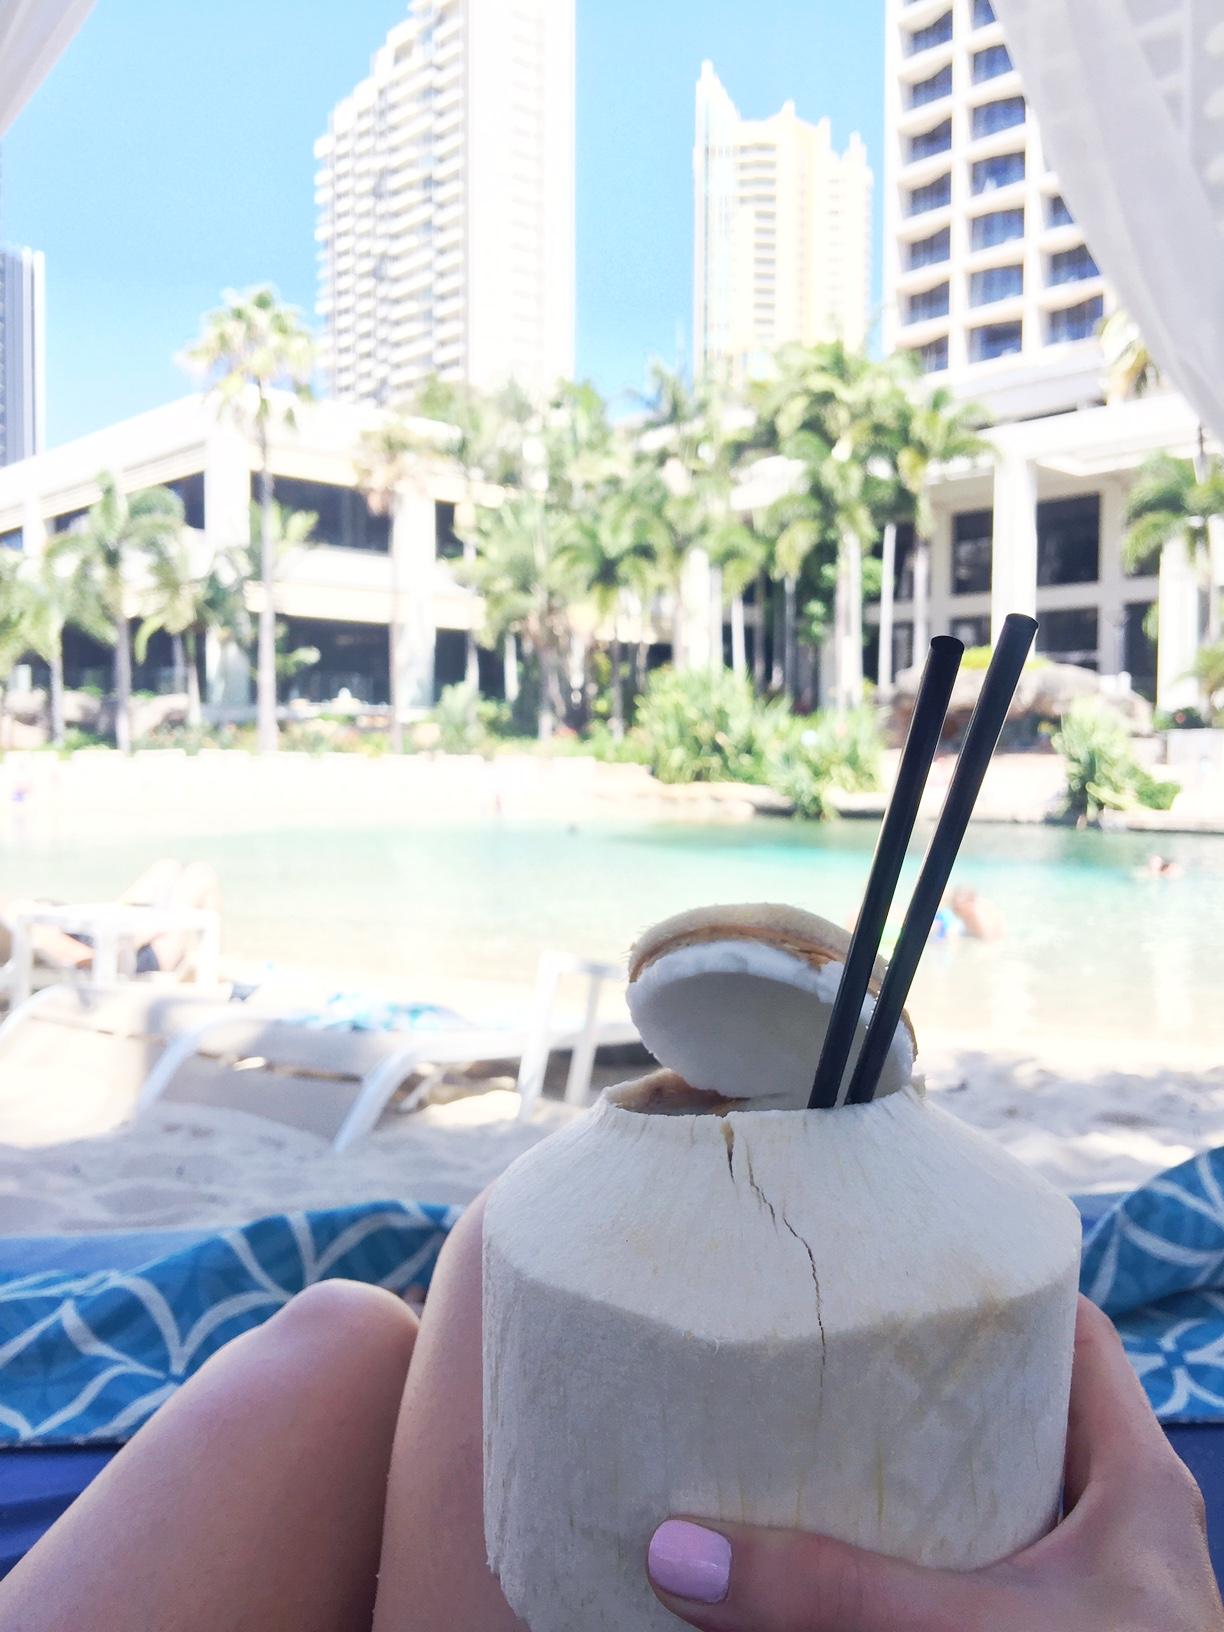 surfers paradise marriott resort and spa gold coast australia beach honeymoon romantic couples holiday luxury vacation hotel review pina colada in coconut pool cabana